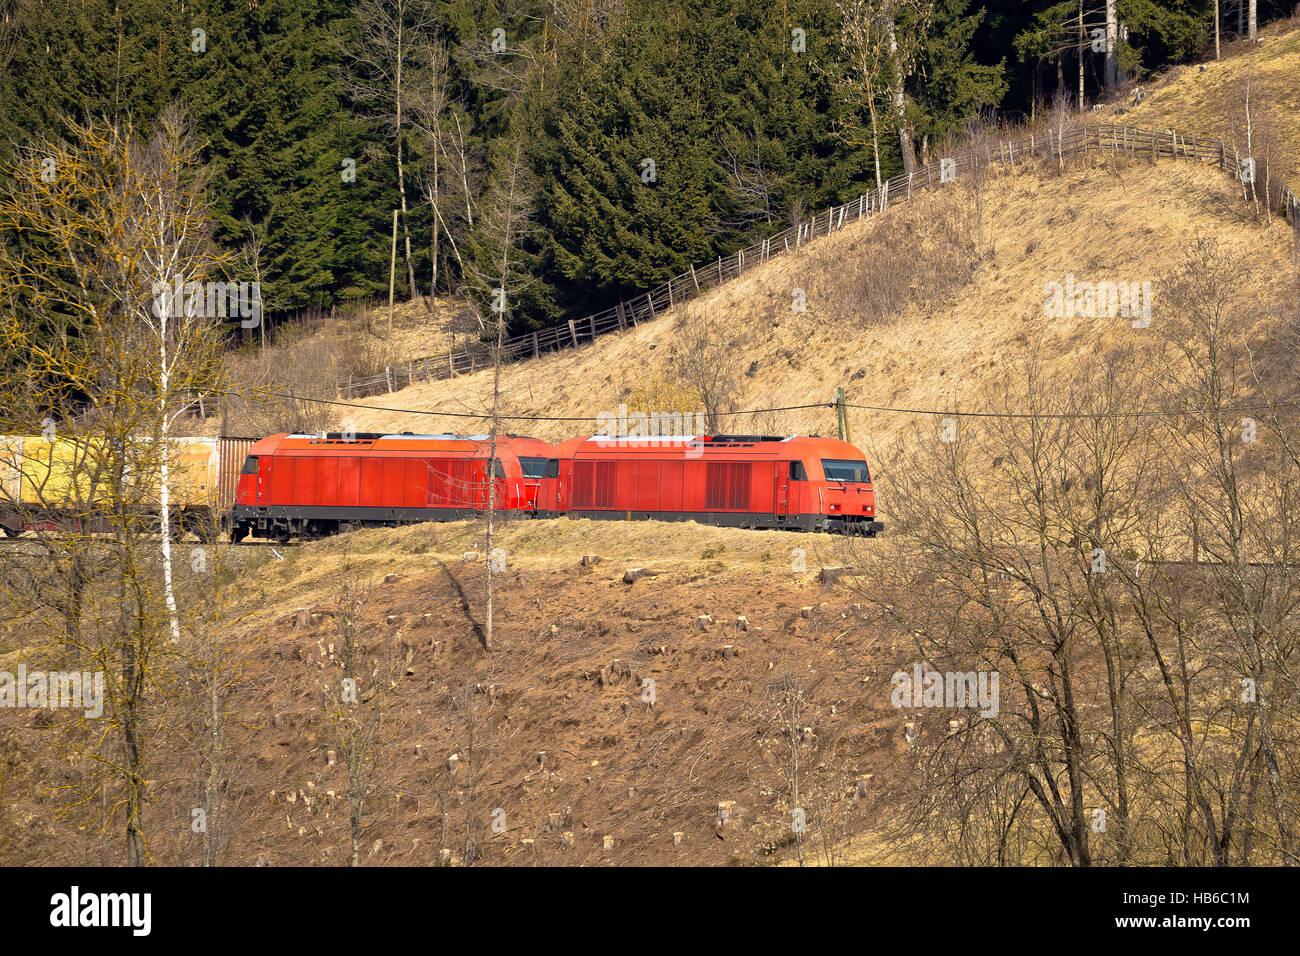 Austrian railways OBB train in nature - Stock Image